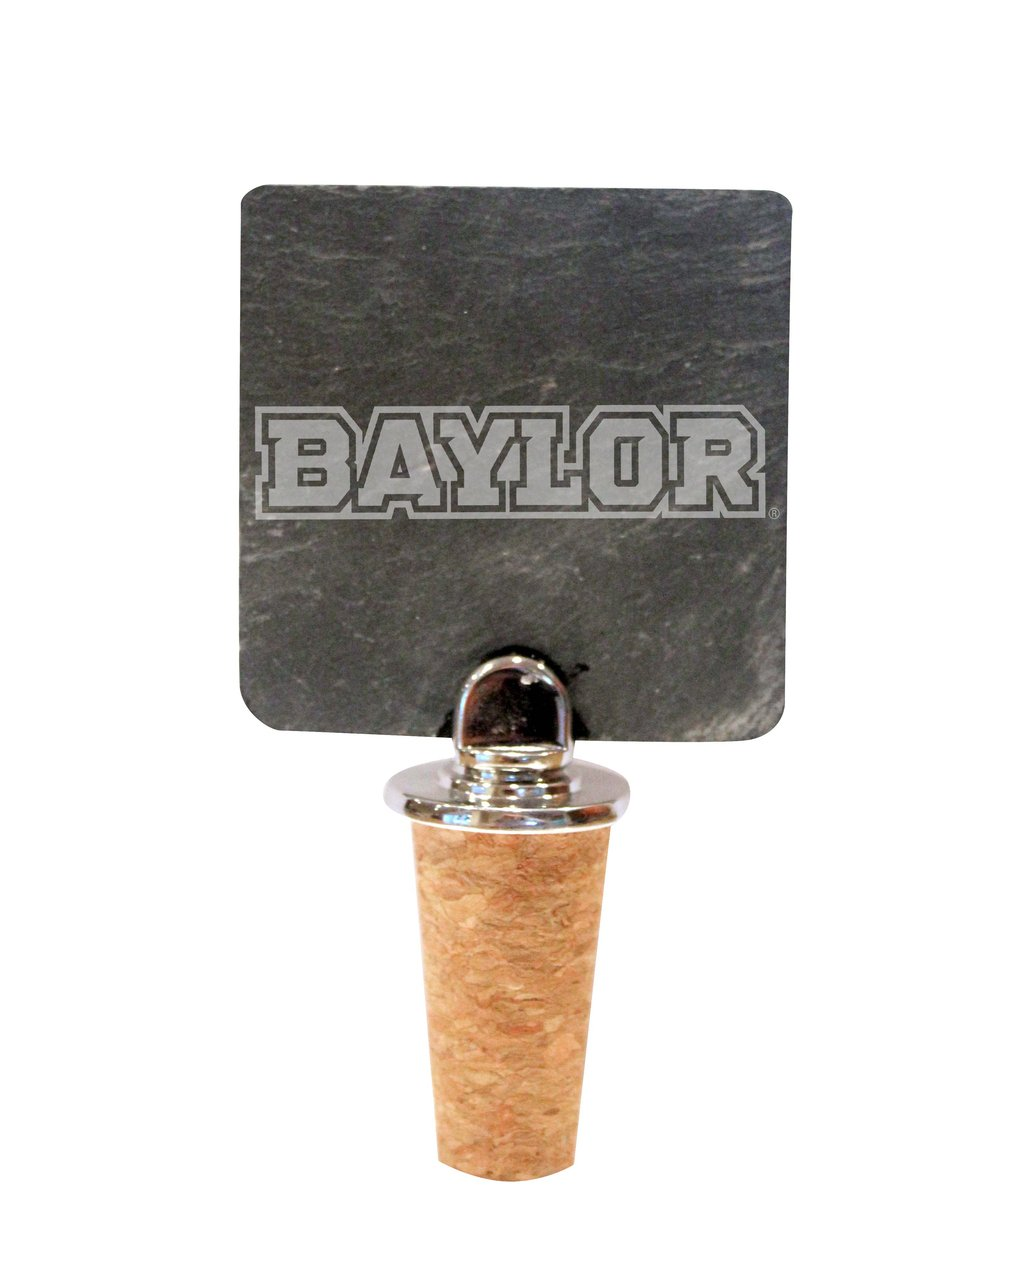 Baylor Slate Bottle Stopper by The College Artisan (Image #1)